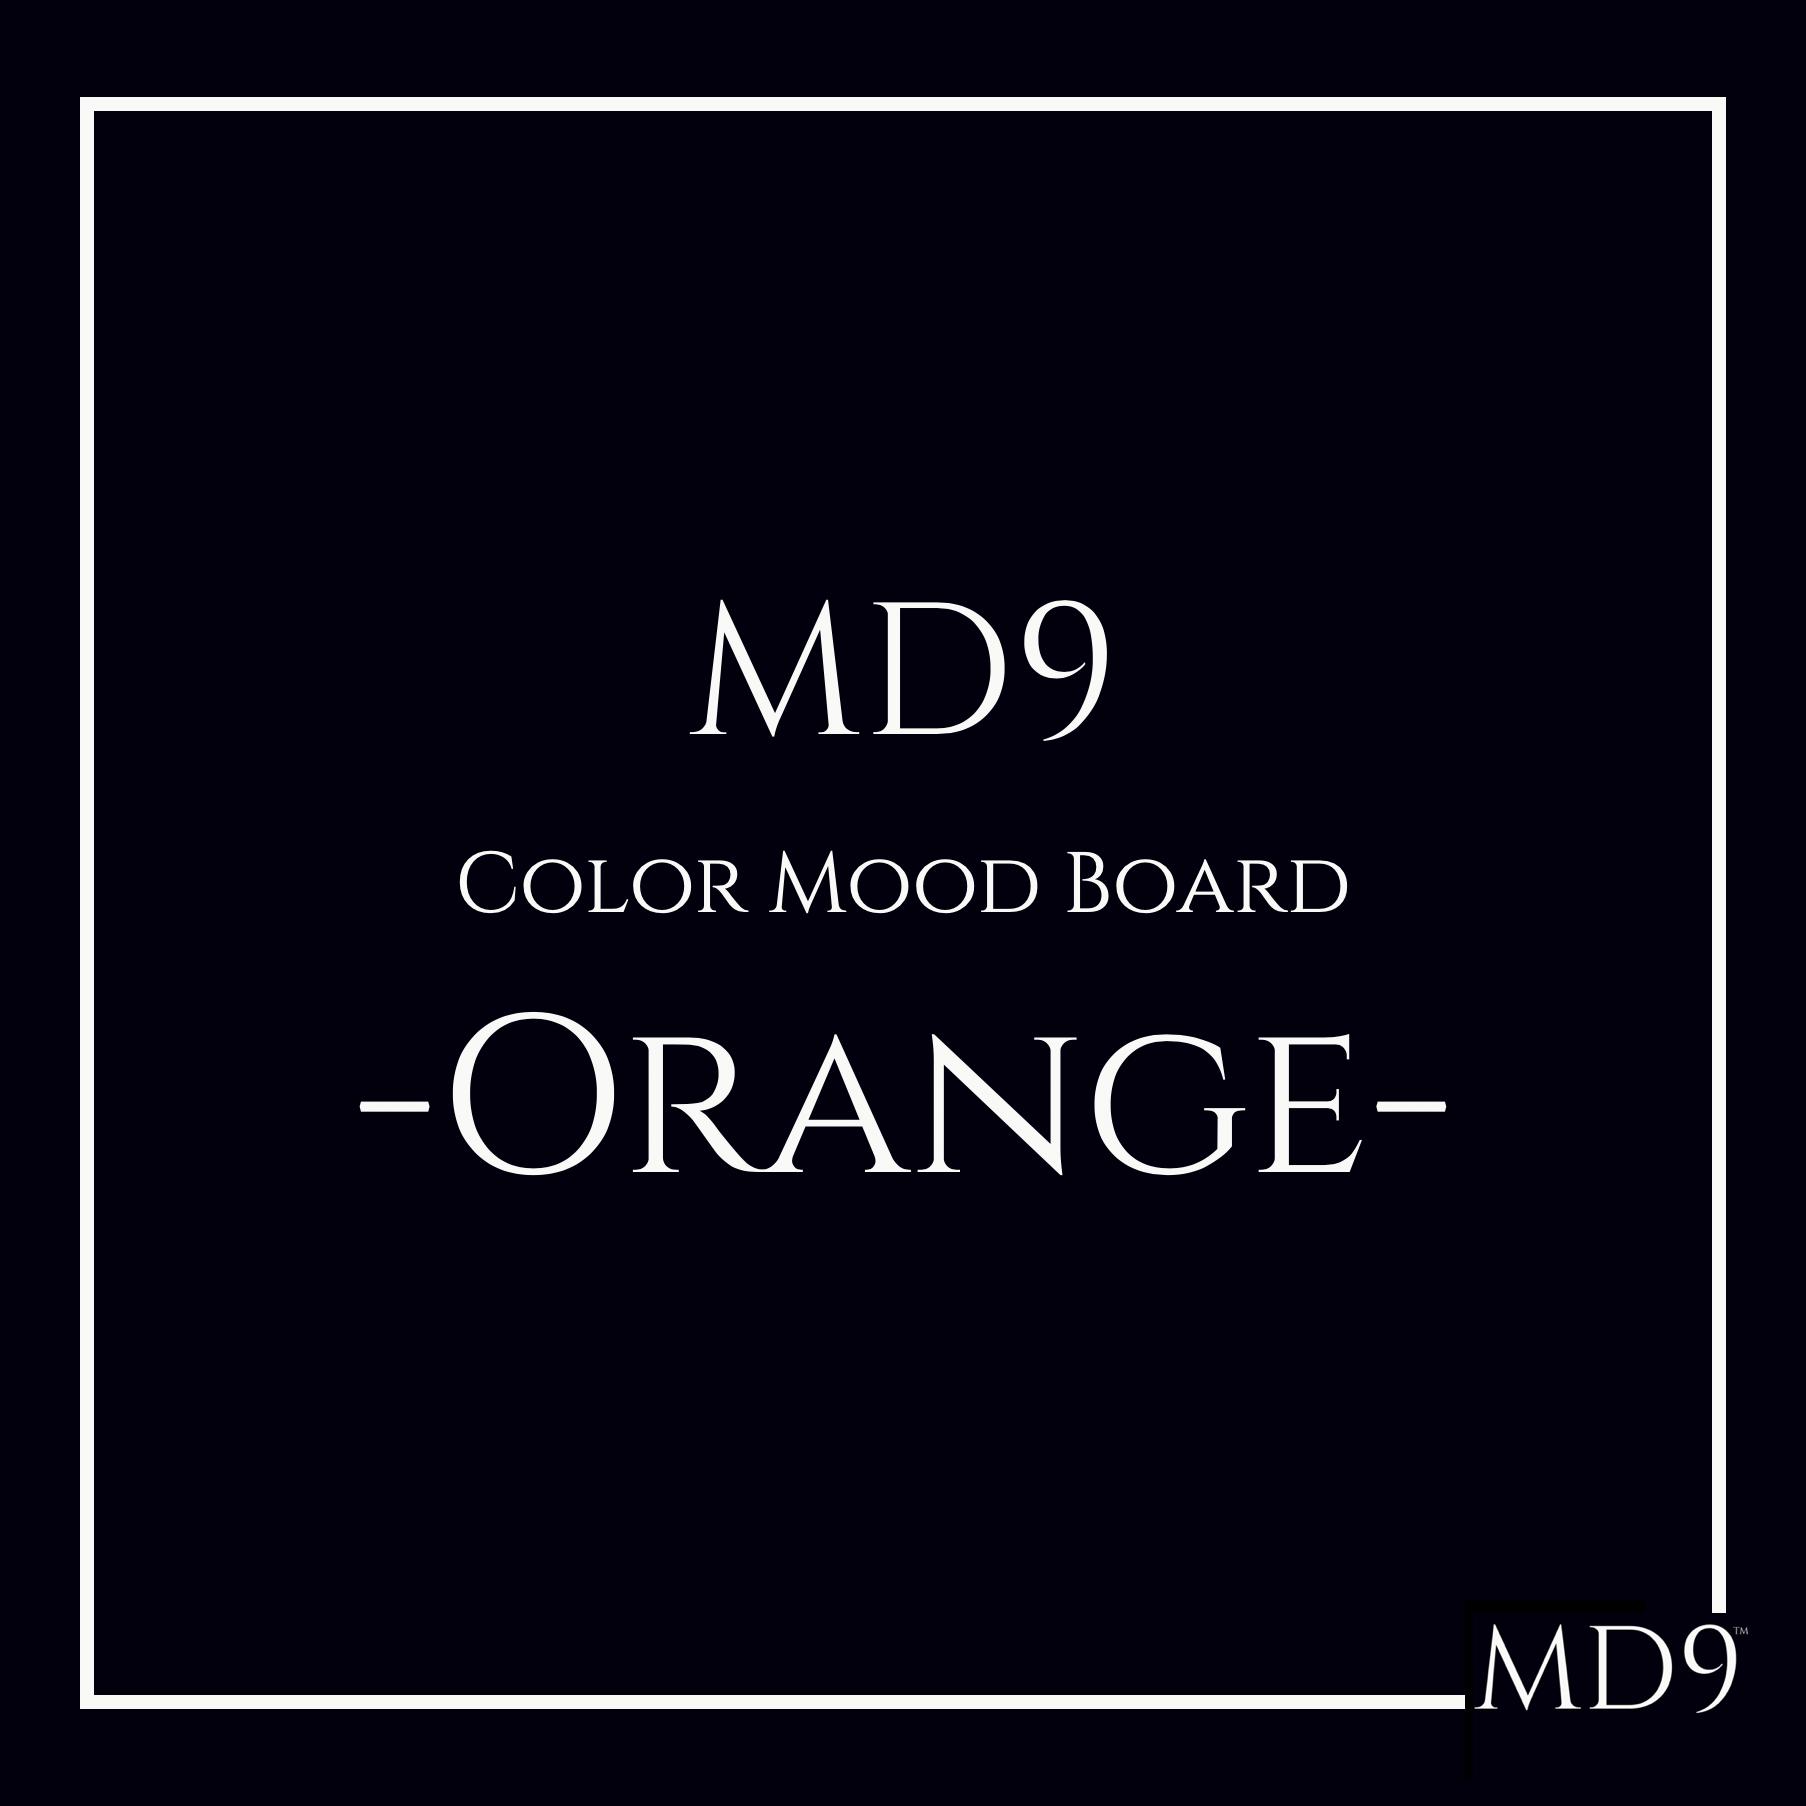 MD9's Colors Mood Board – Orange